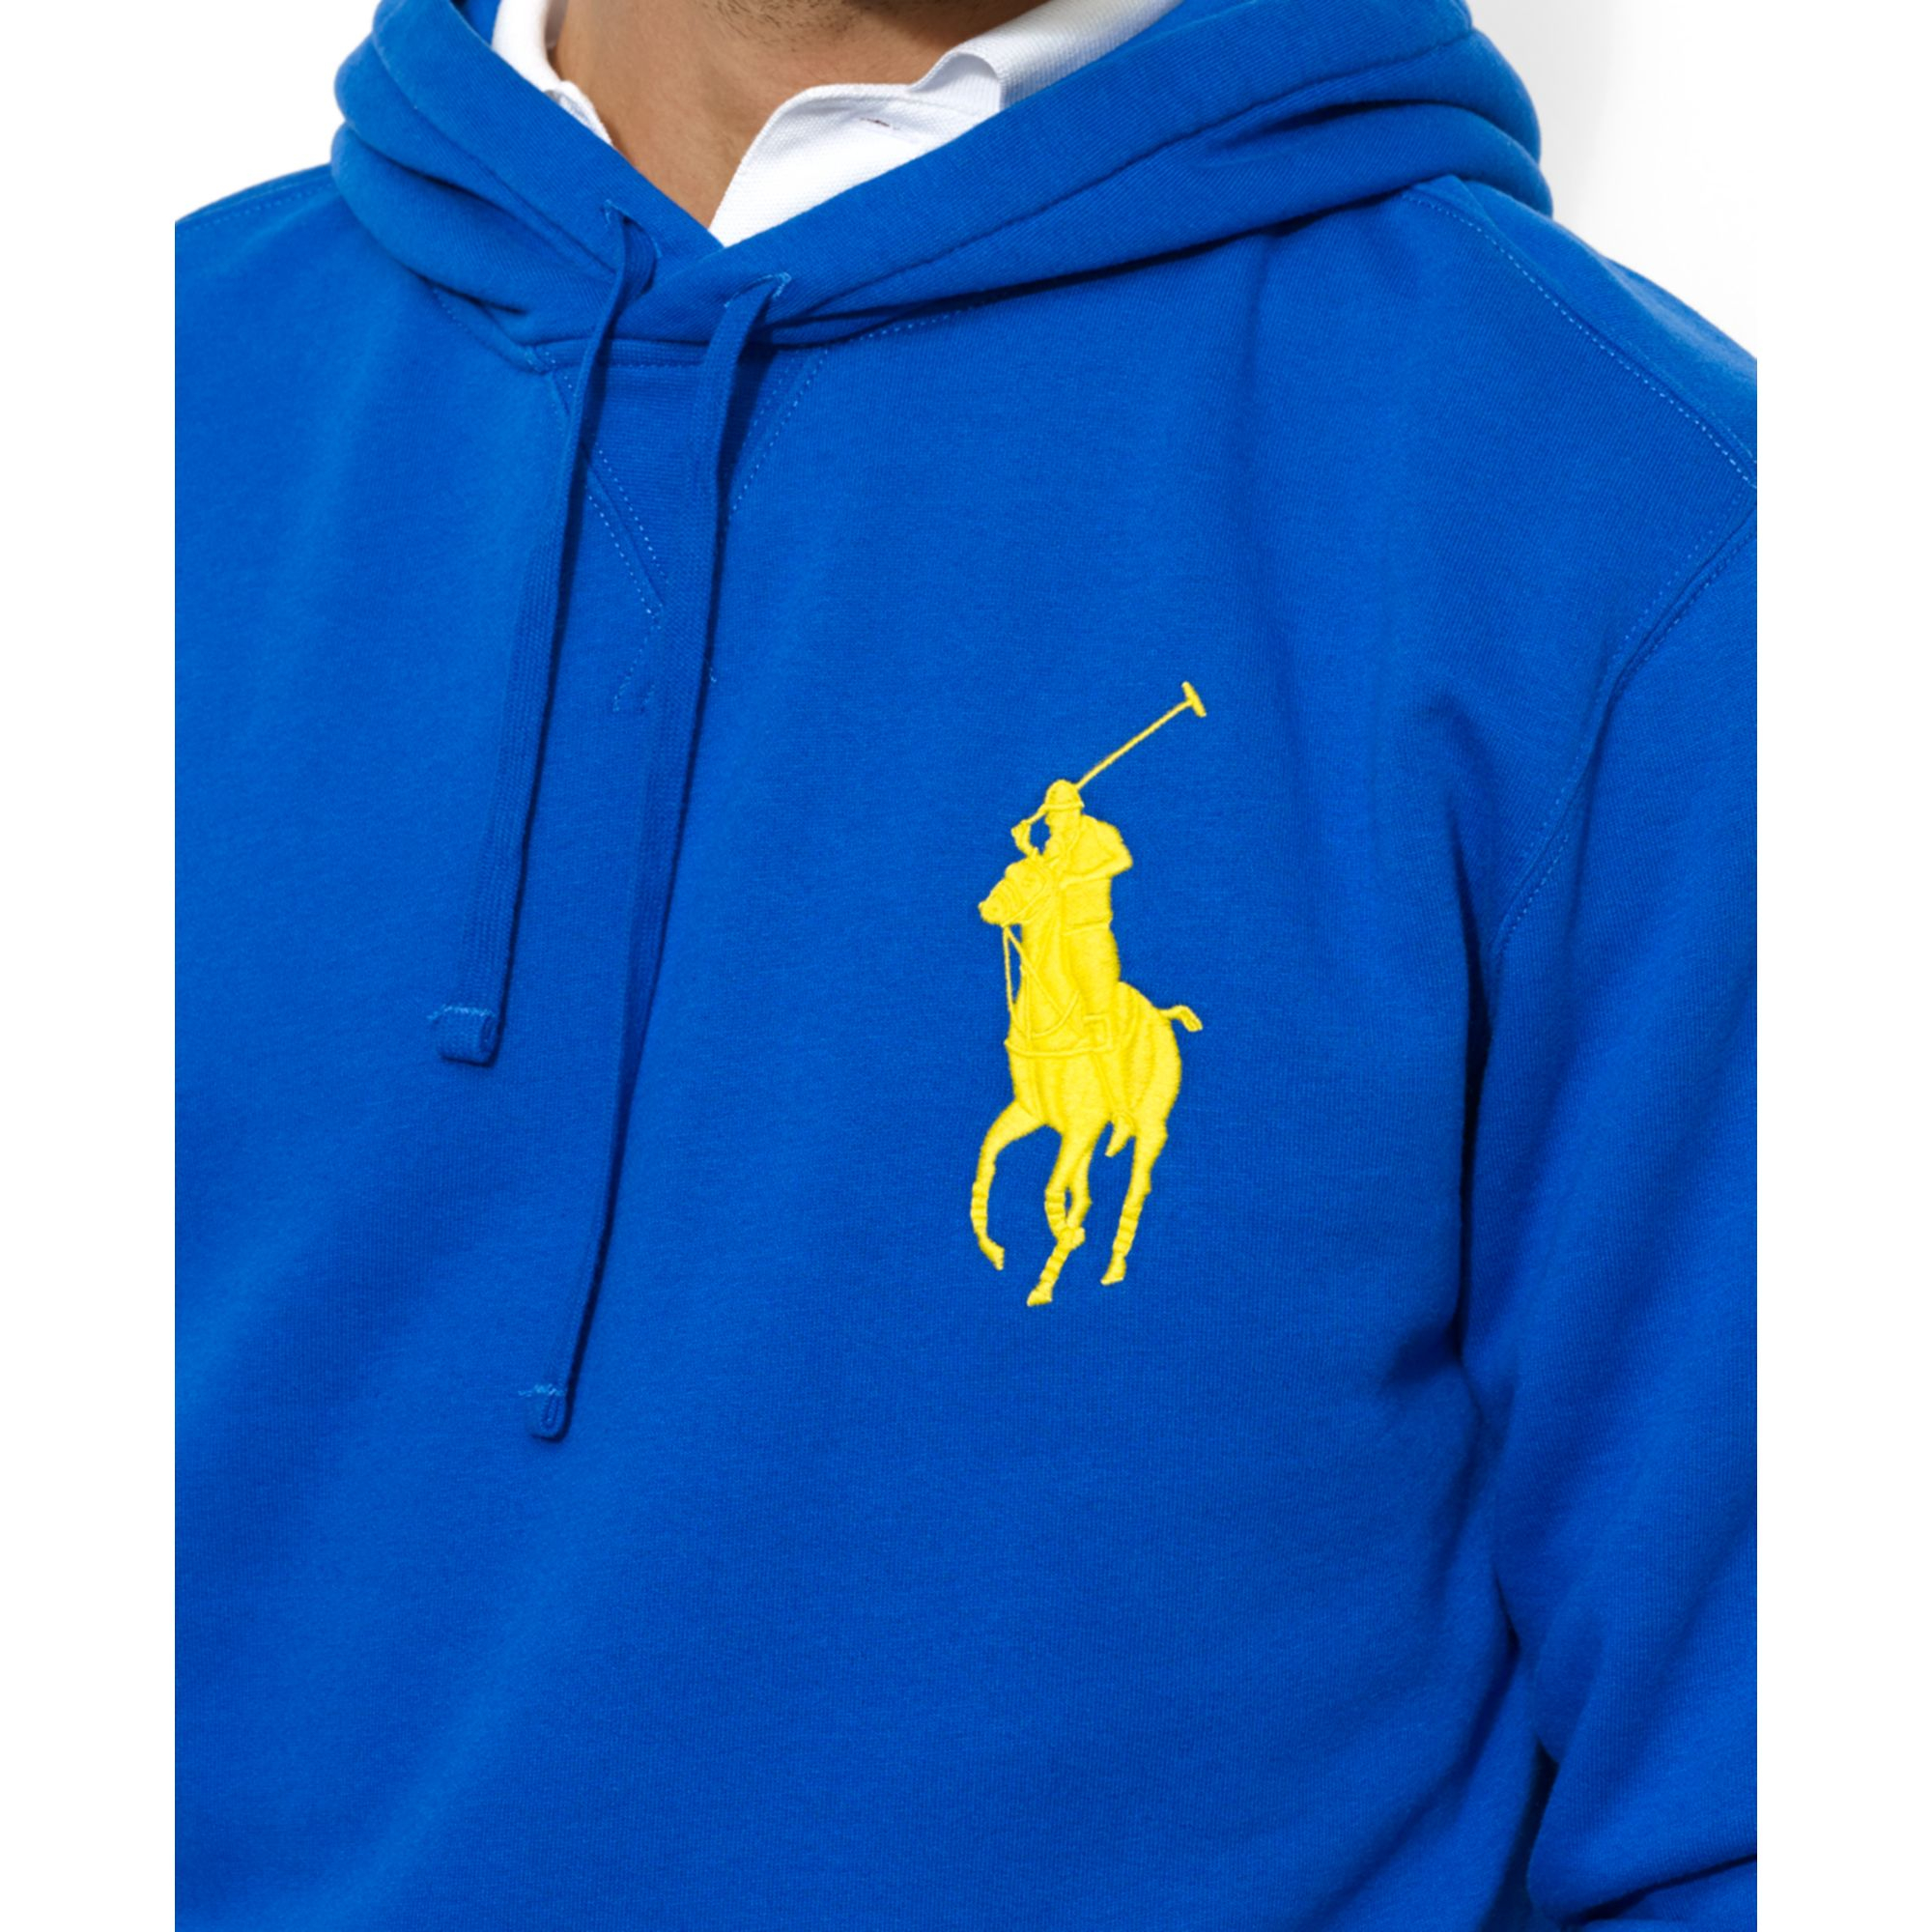 Ralph Lauren Hoodie Royal Blue Pullover POLO Ralph Lauren Pullover Embroidered Logo Cobalt Blue Sweatshirt Yellow Pony Logo Medium Size rmKZq7x1kH